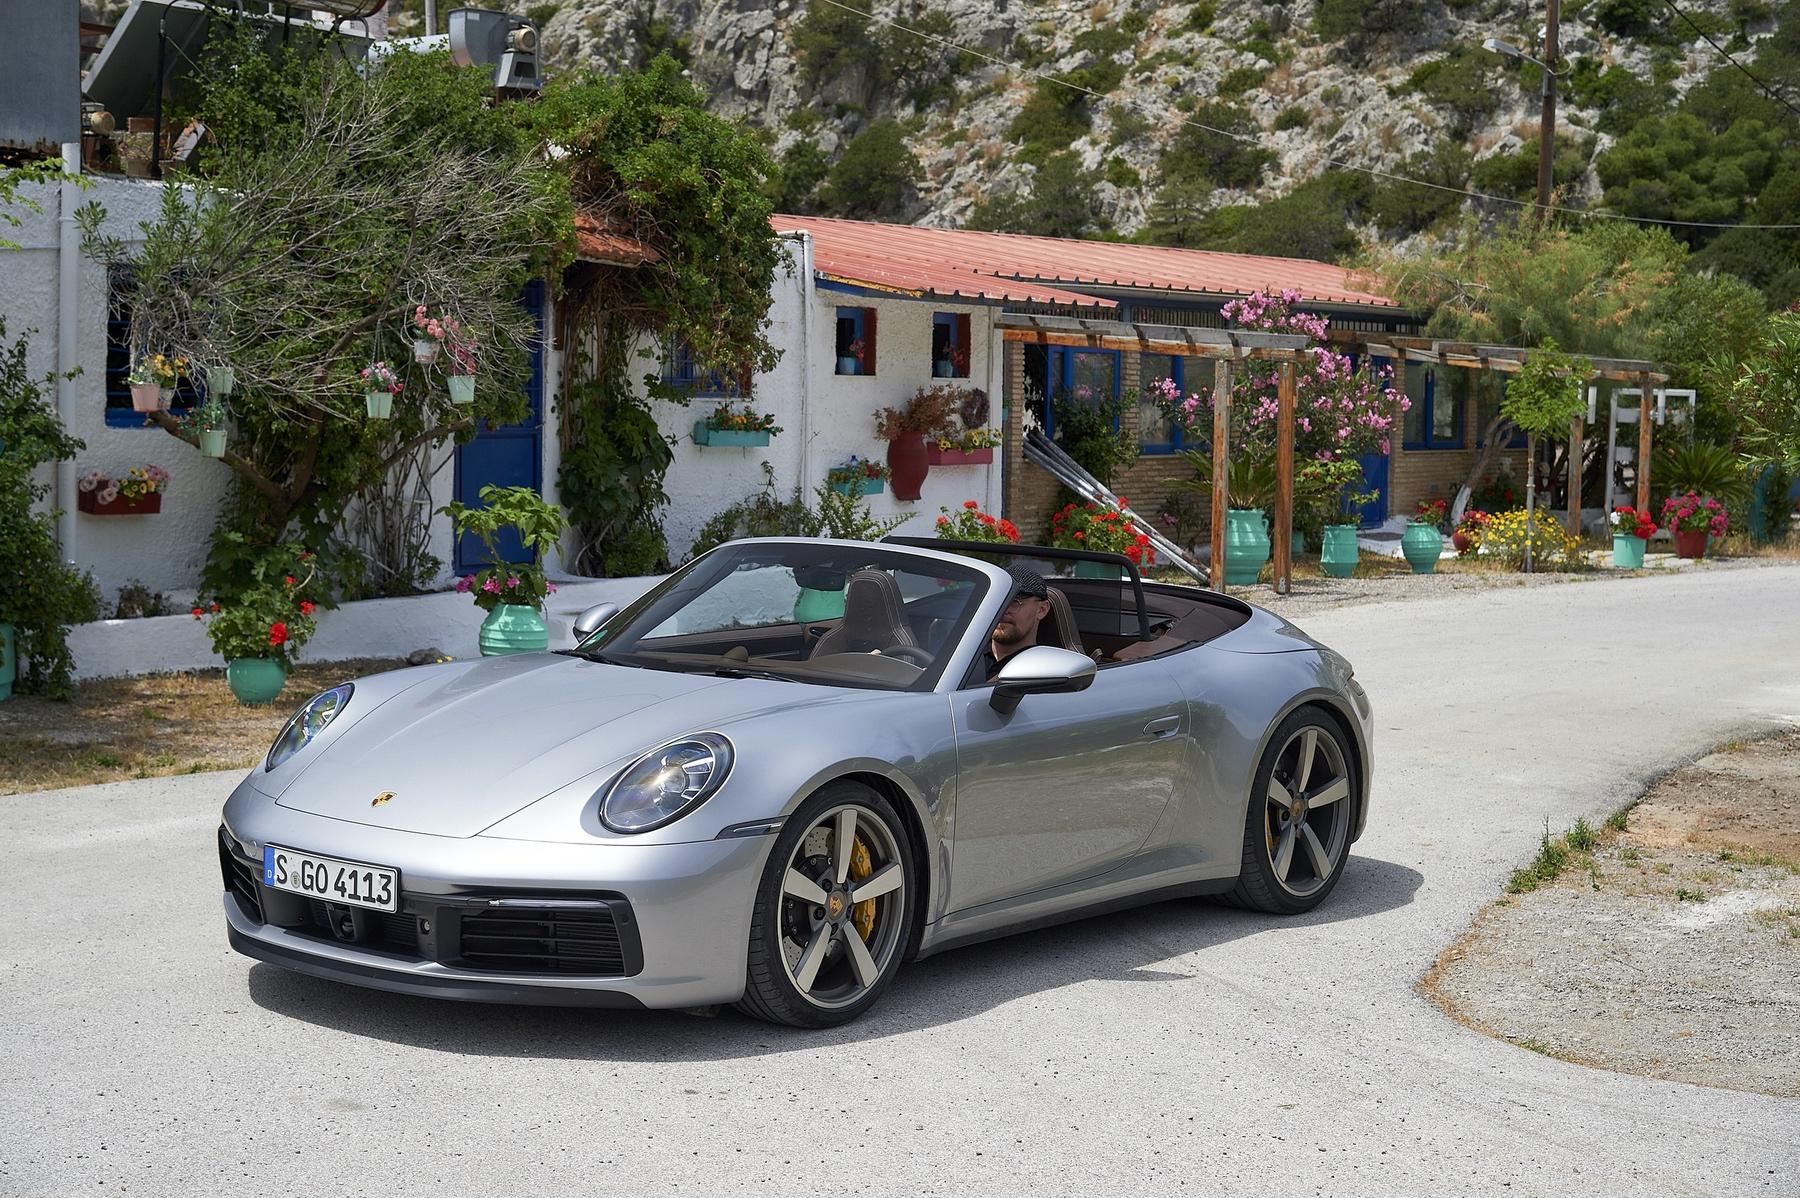 Test_Drive_Porsche_911_Athens_0133